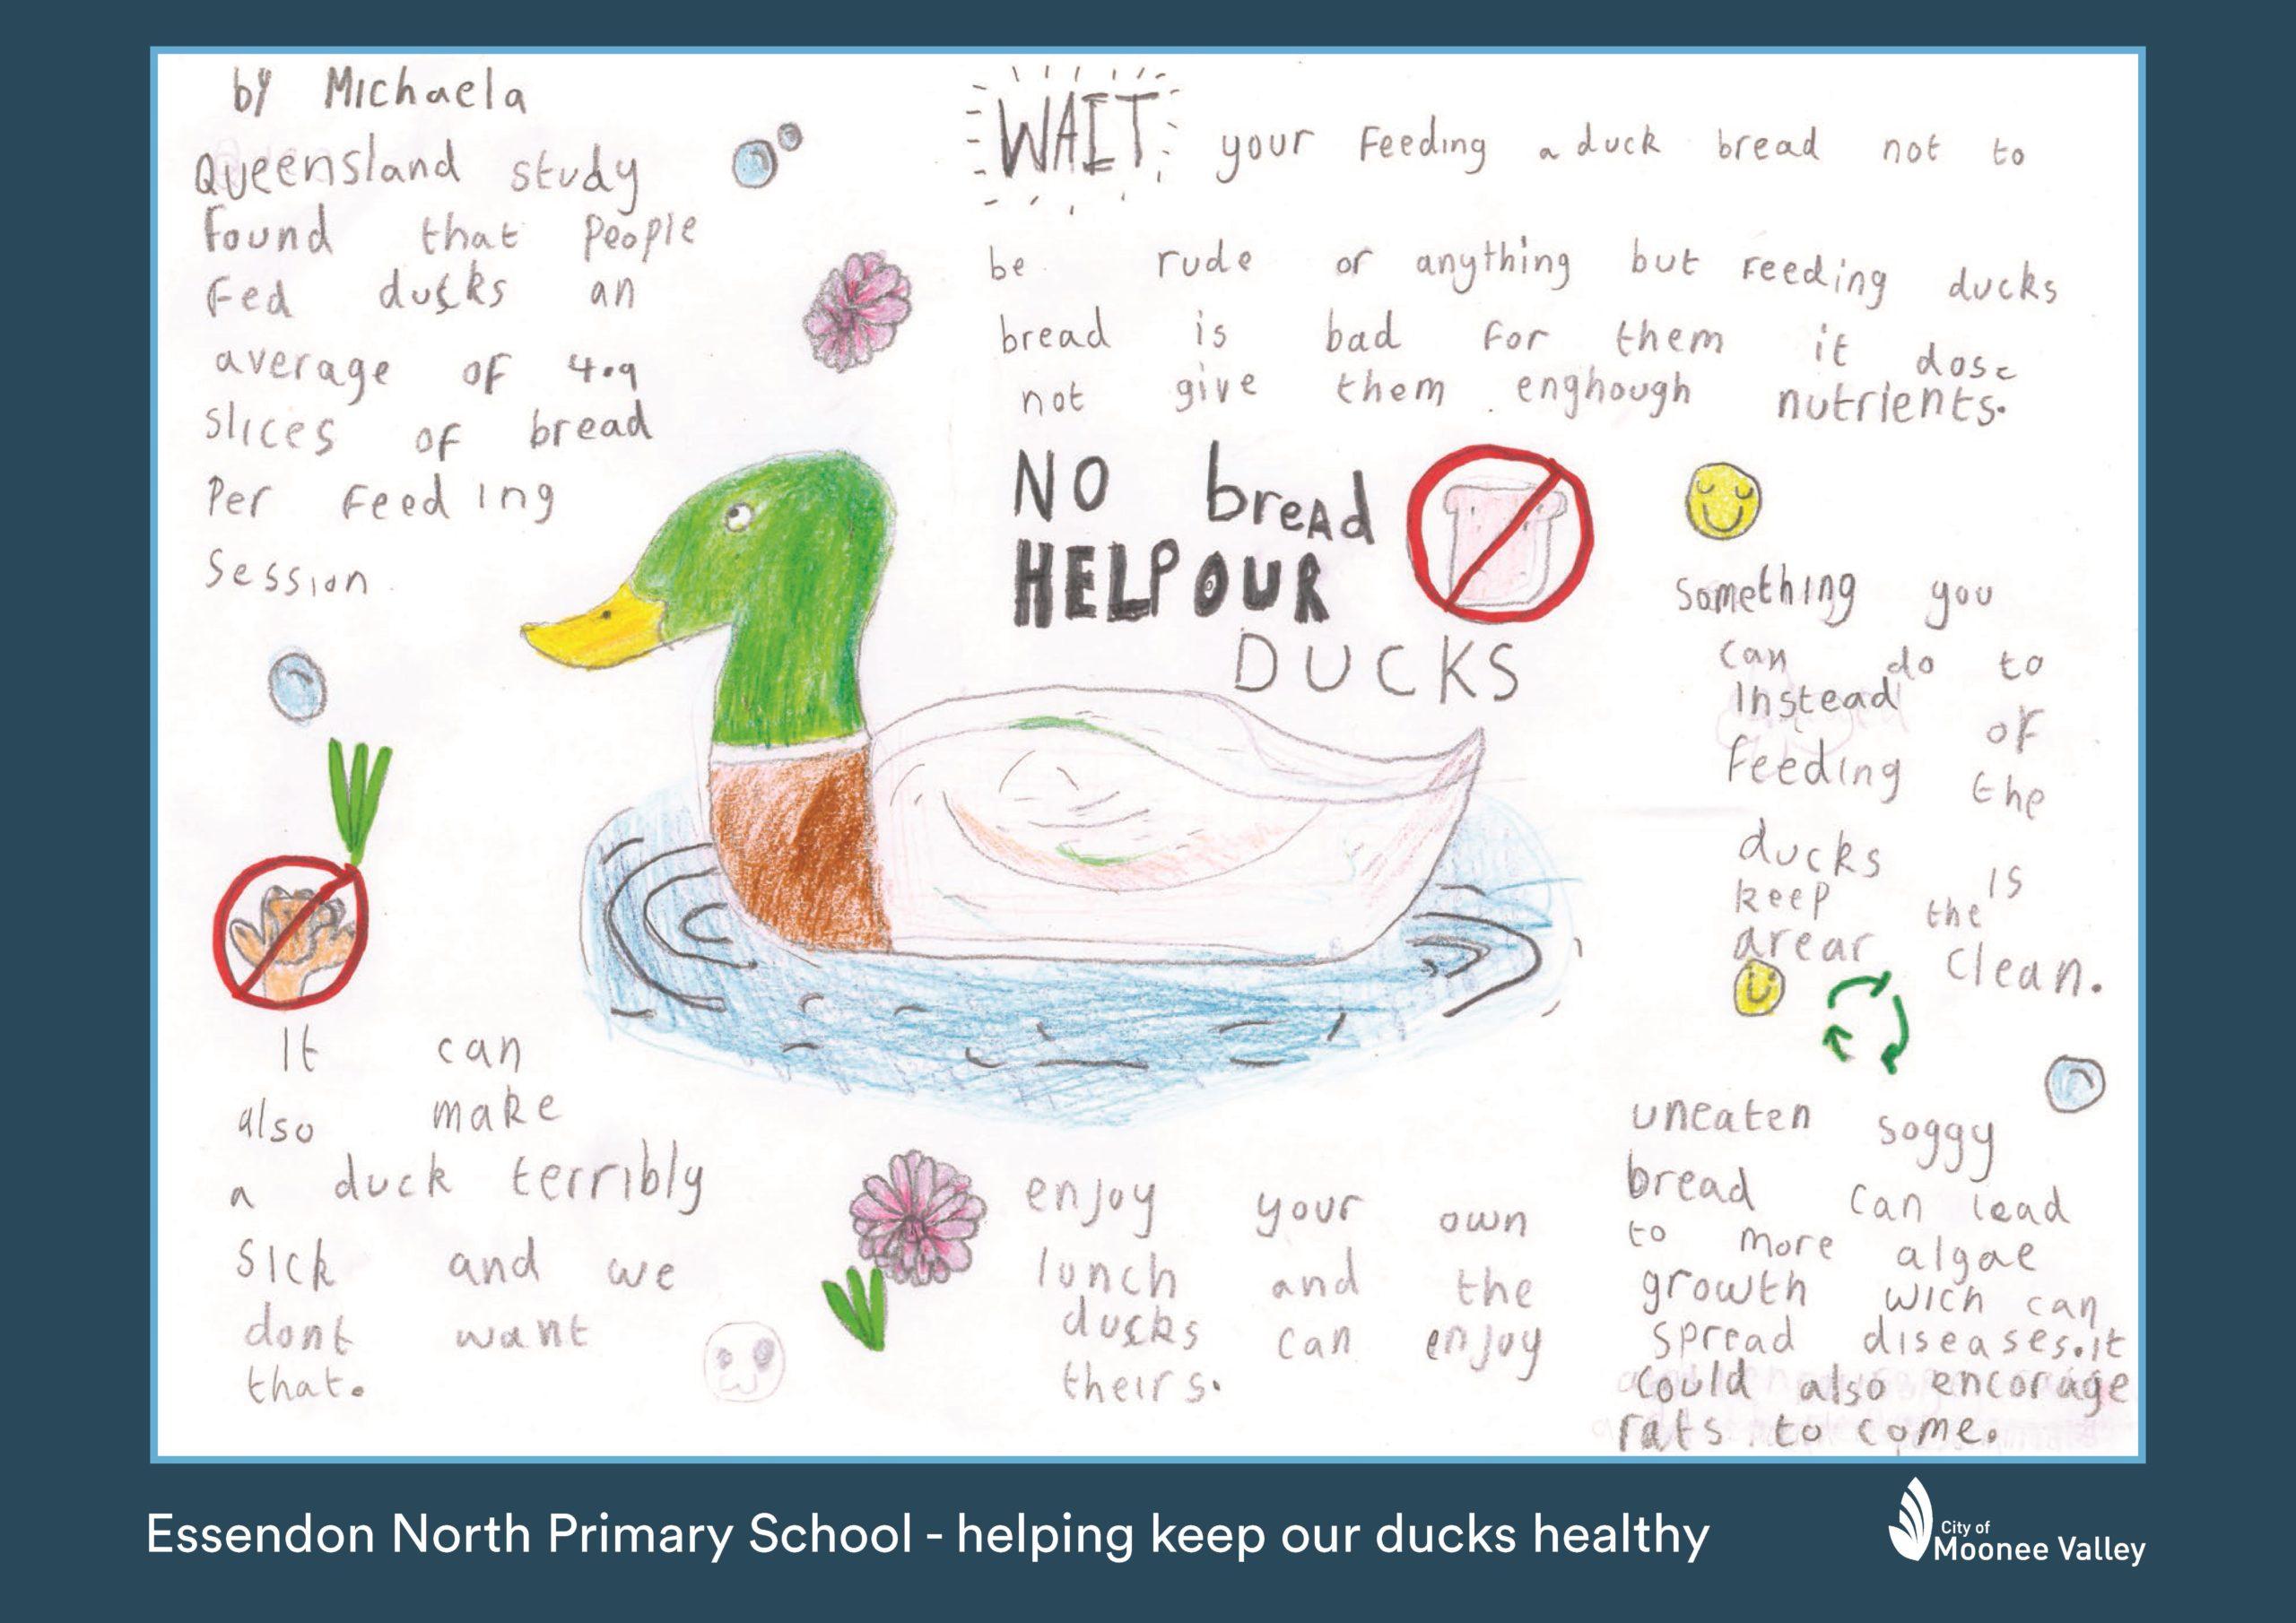 20 215052 ENPS Woodlands Park Duck Poster Michaela